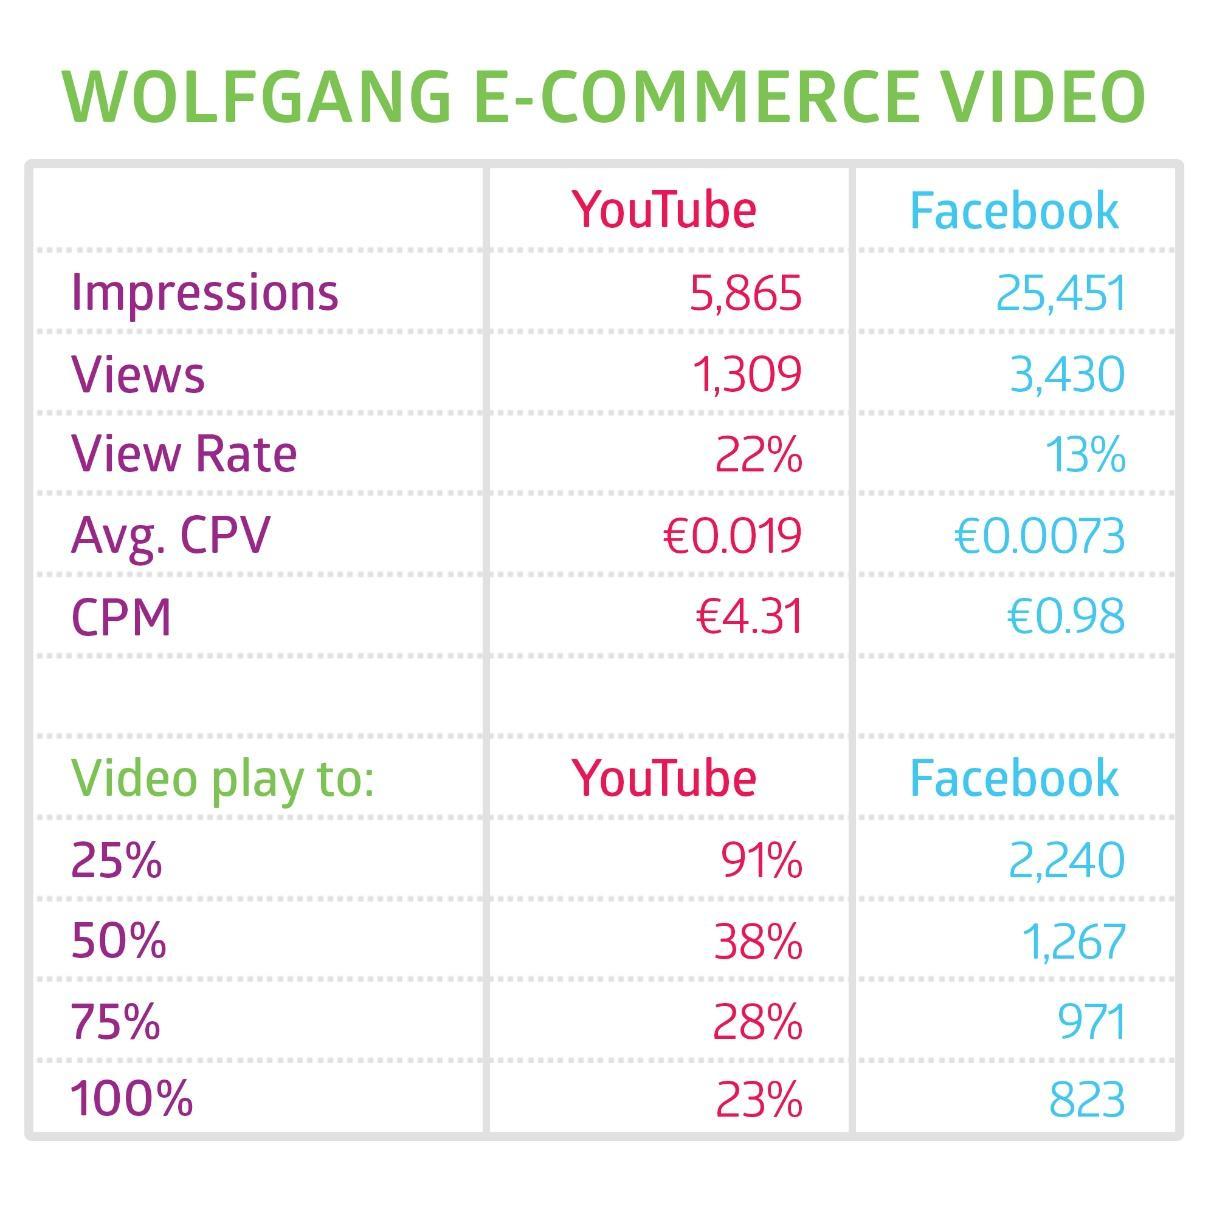 Vidéos vues FAcebook versus Youtube